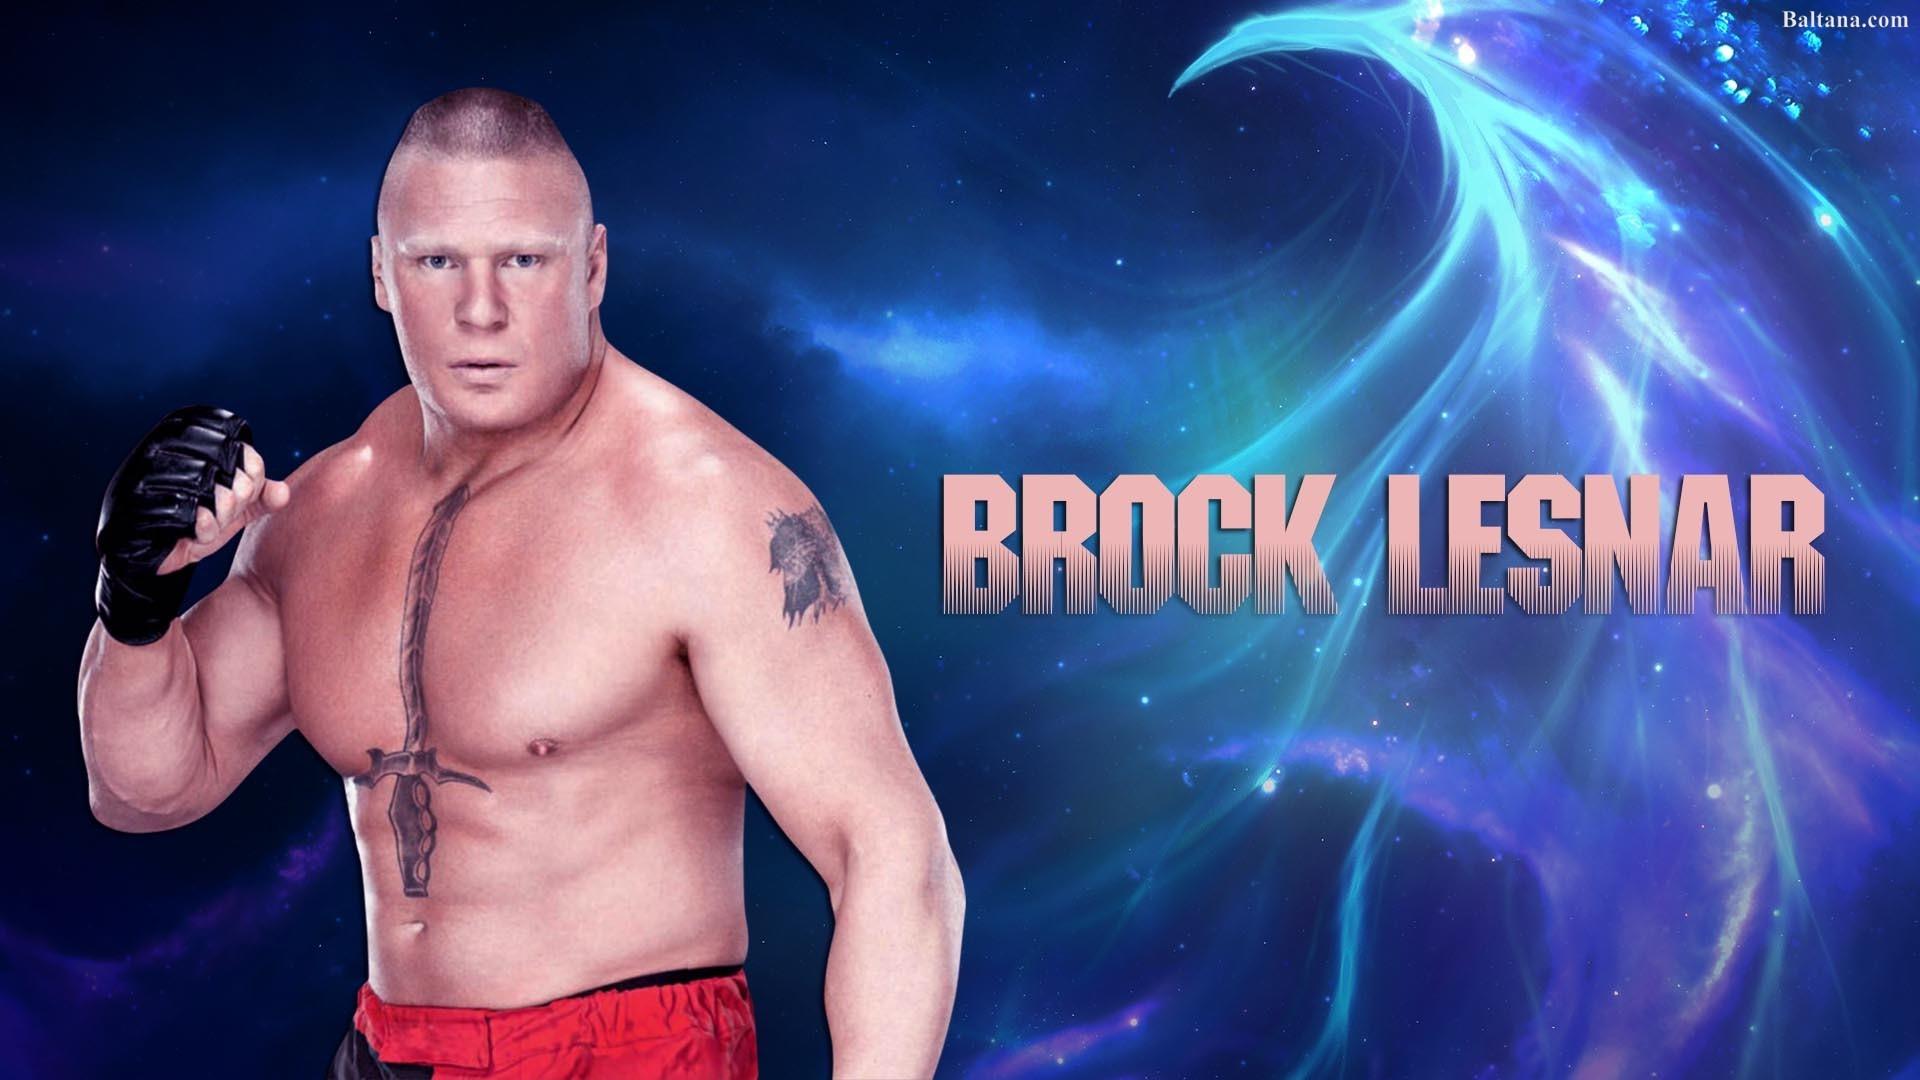 Wwe Brock Lesnar 2018 Wallpaper 80 Pictures